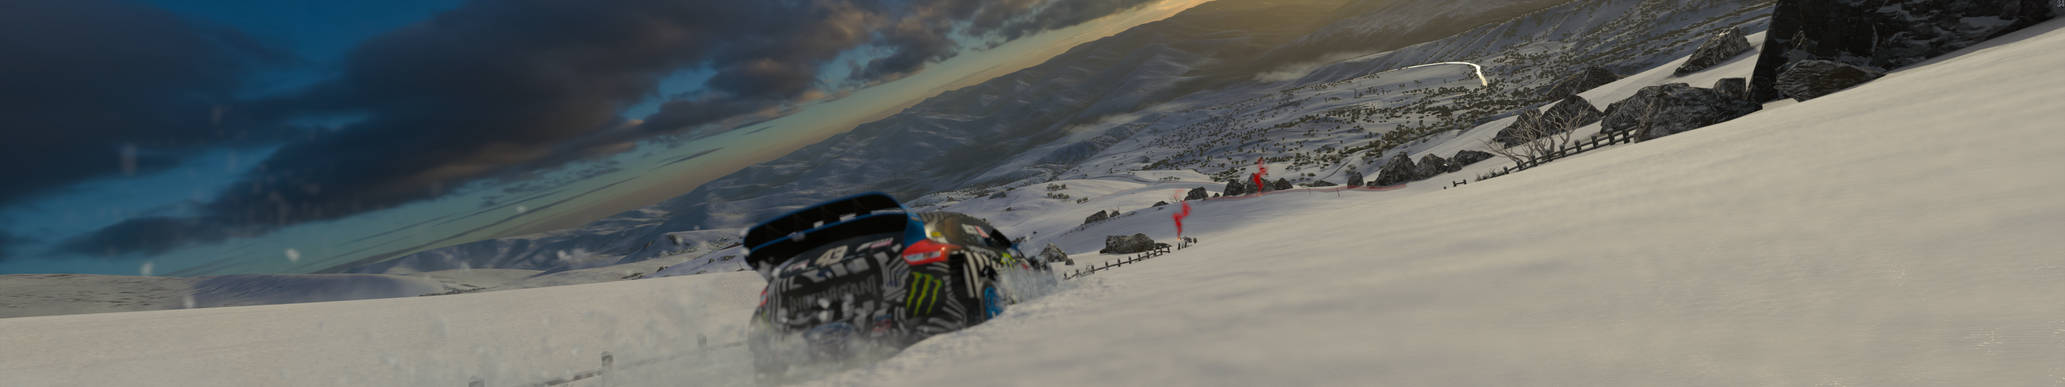 Forza Horizon 3 (5760x1080) Wallpaper